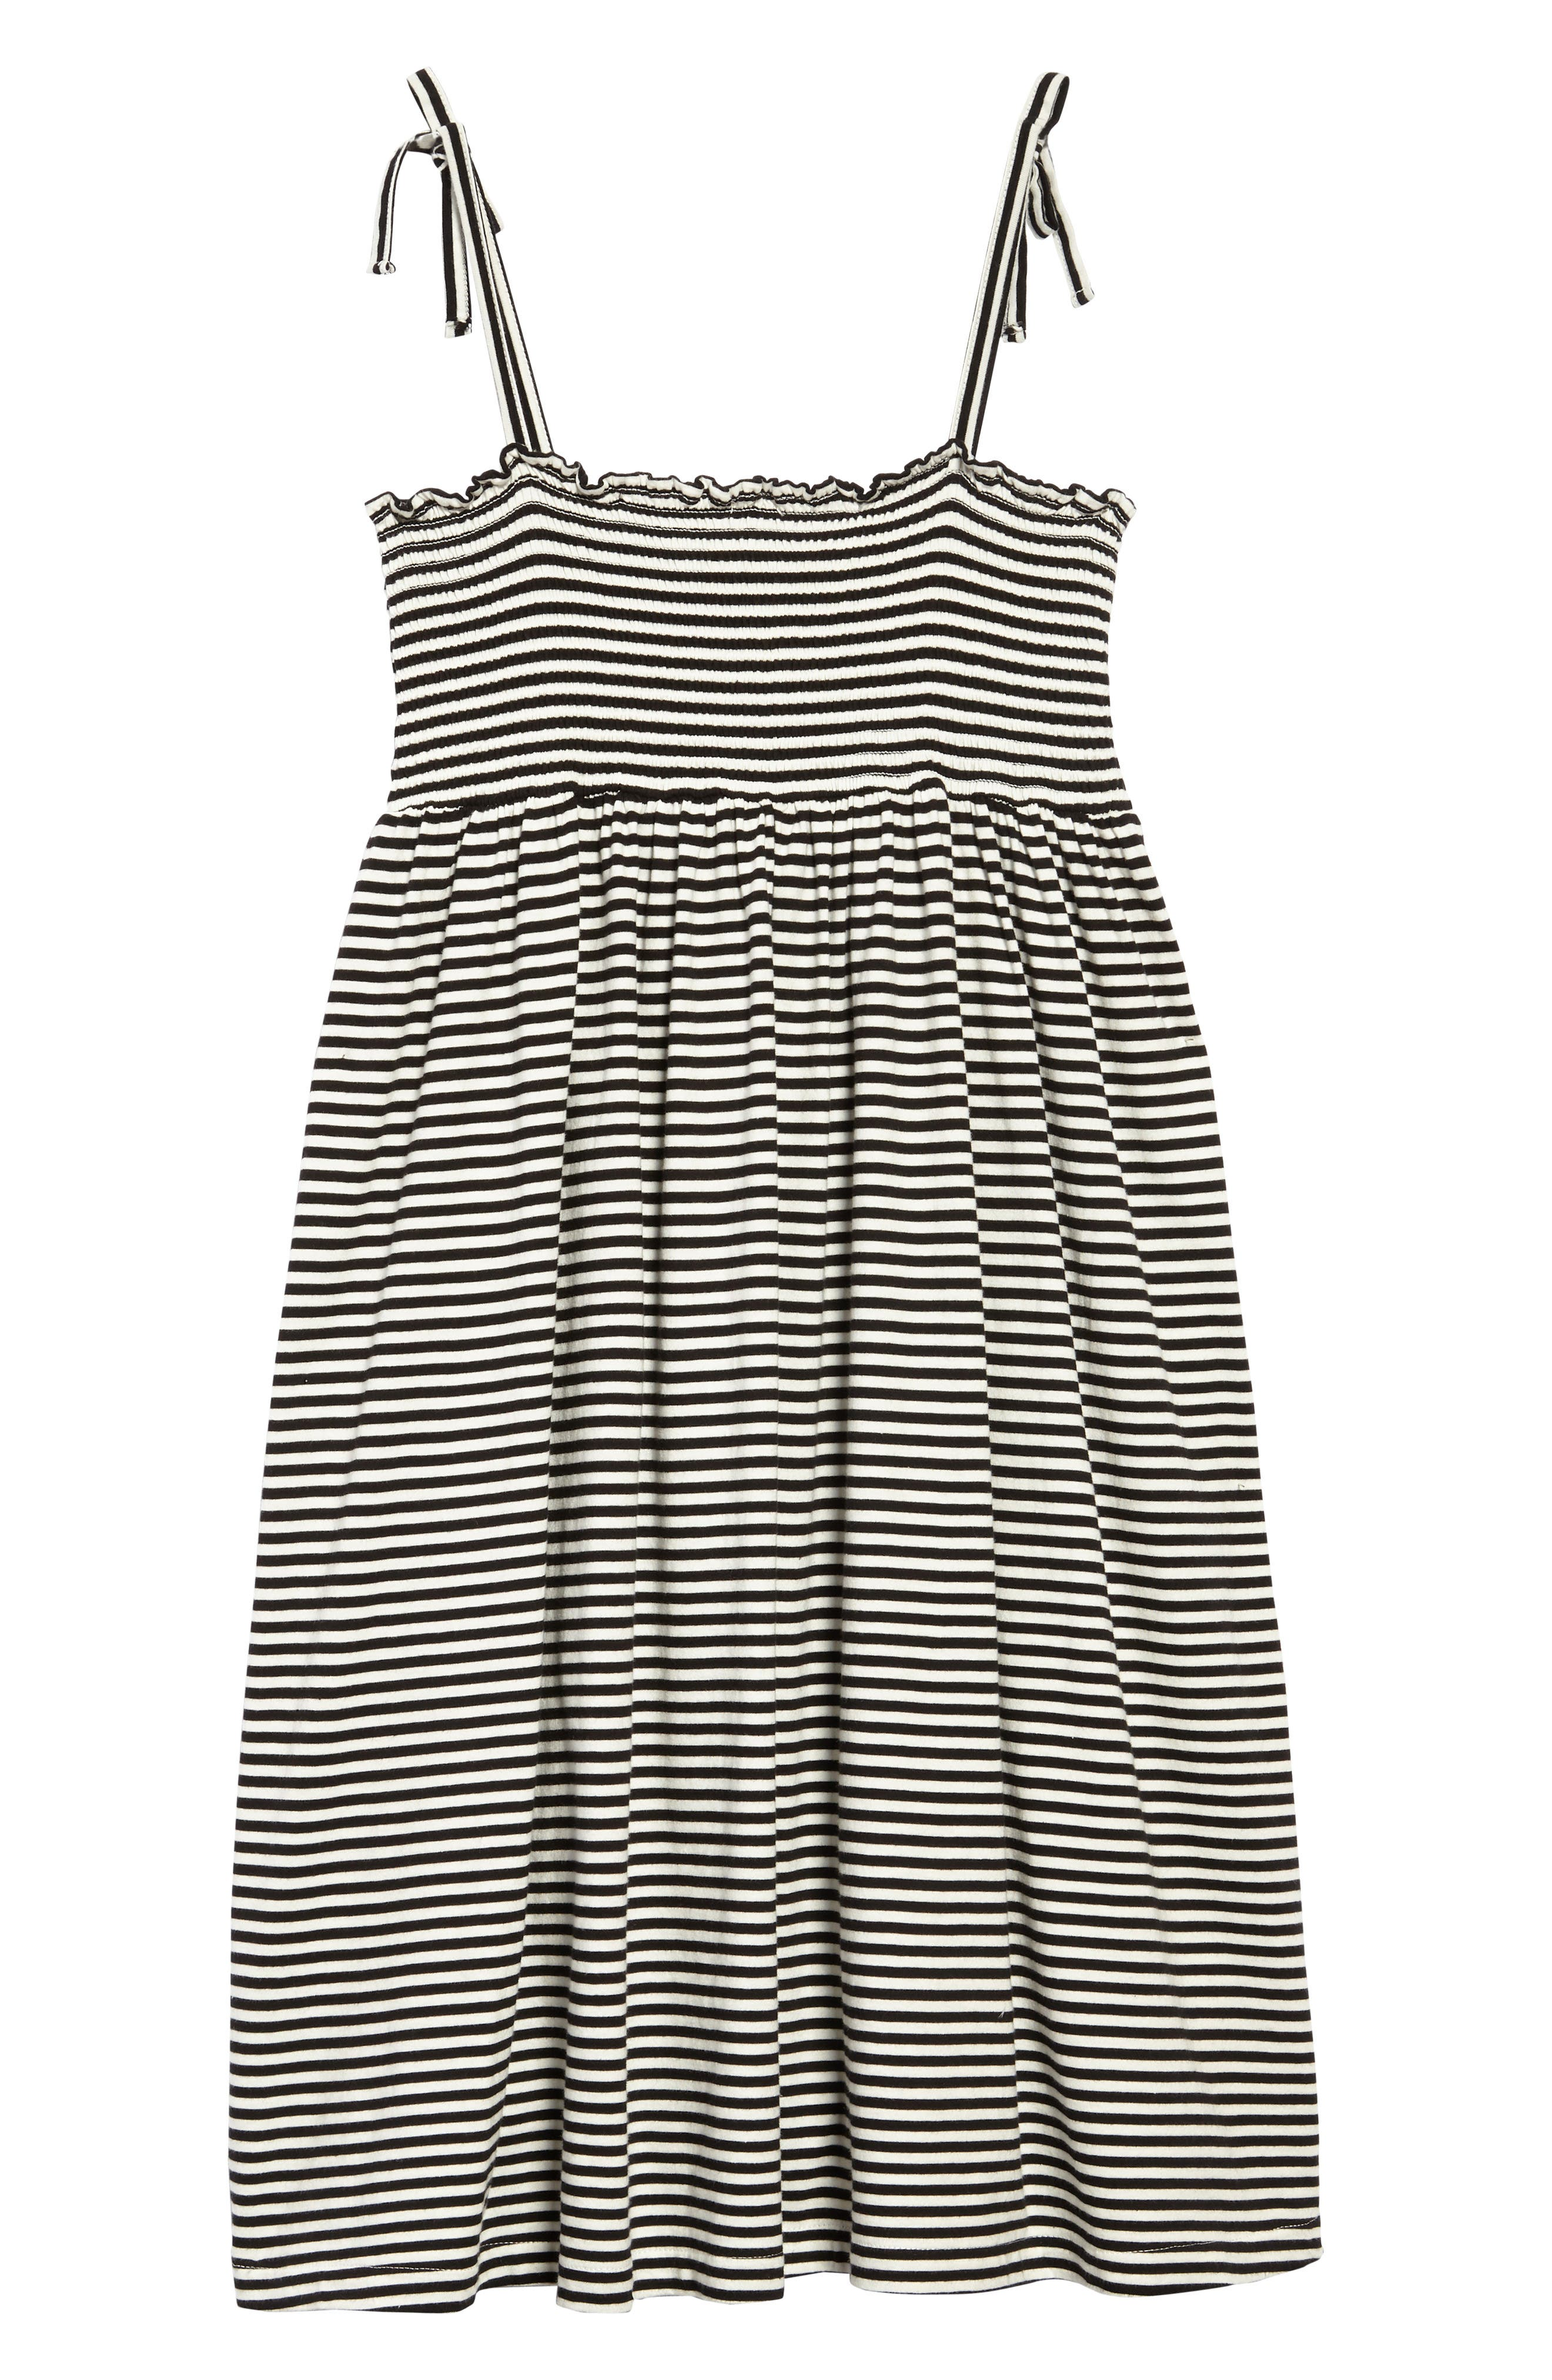 Stripe Smocked Bodice Dress,                             Alternate thumbnail 2, color,                             Black Ivory Stripe